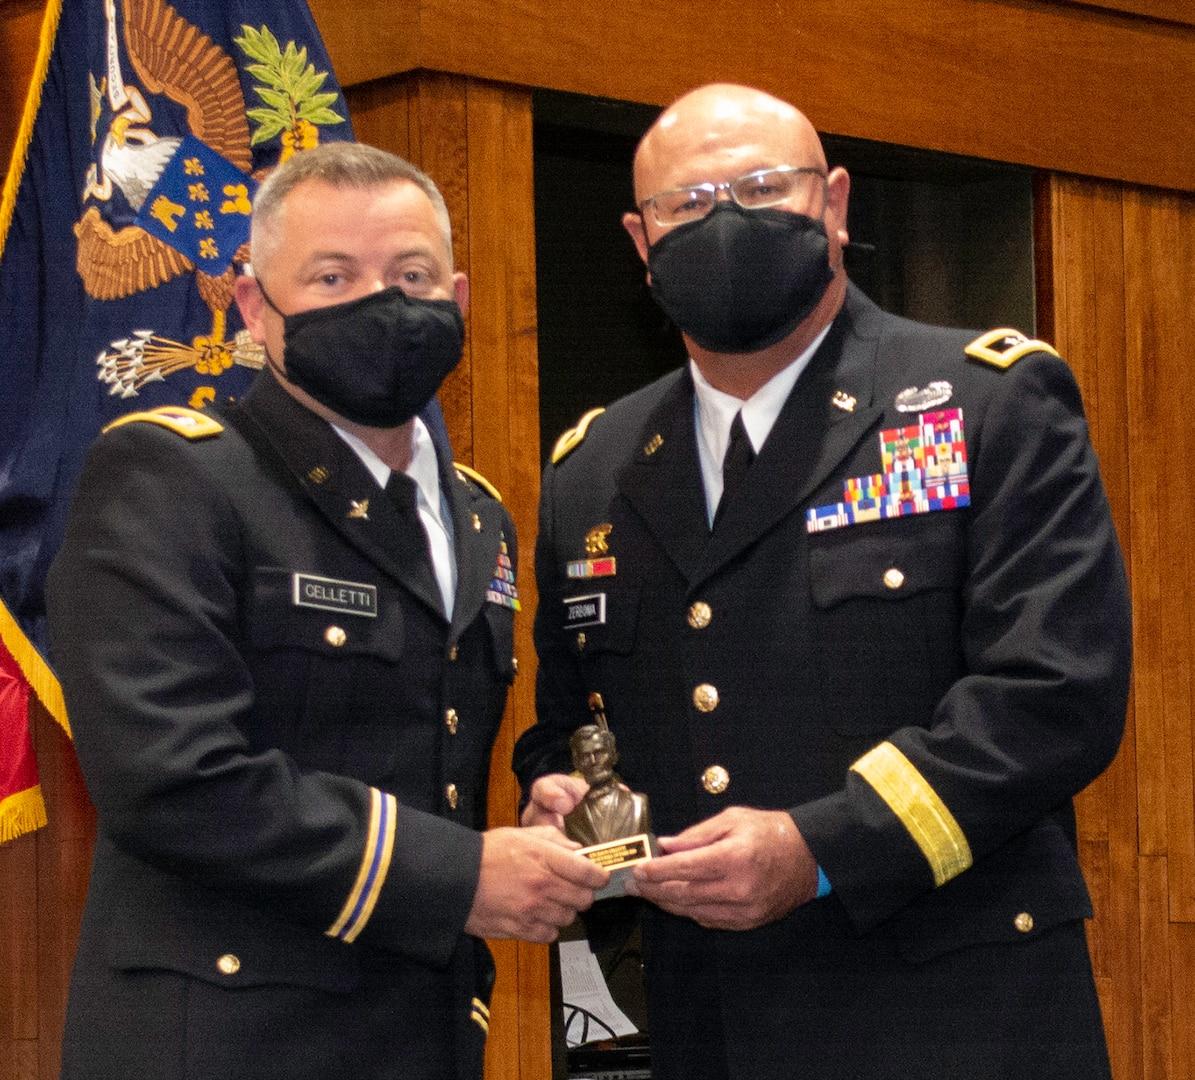 Lt. Col. Jason Celletti, of Springfield, Illinois